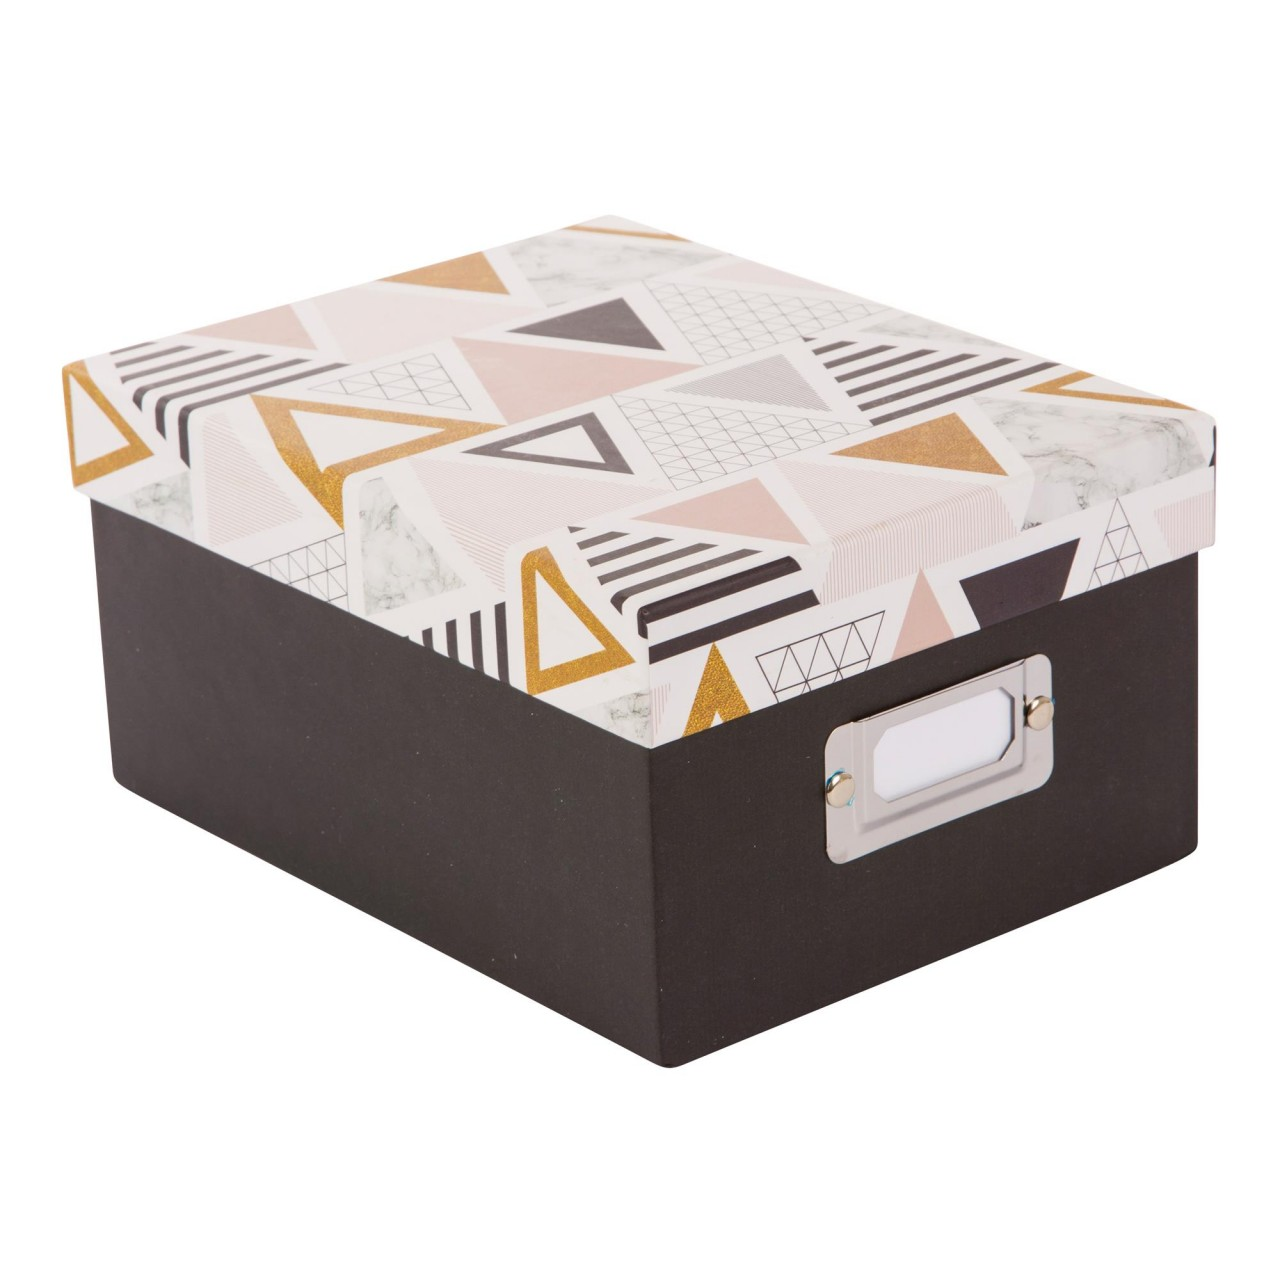 Goldbuch Aufbewahrungsbox net Trig.so Aufbewahrungsbox 85 060